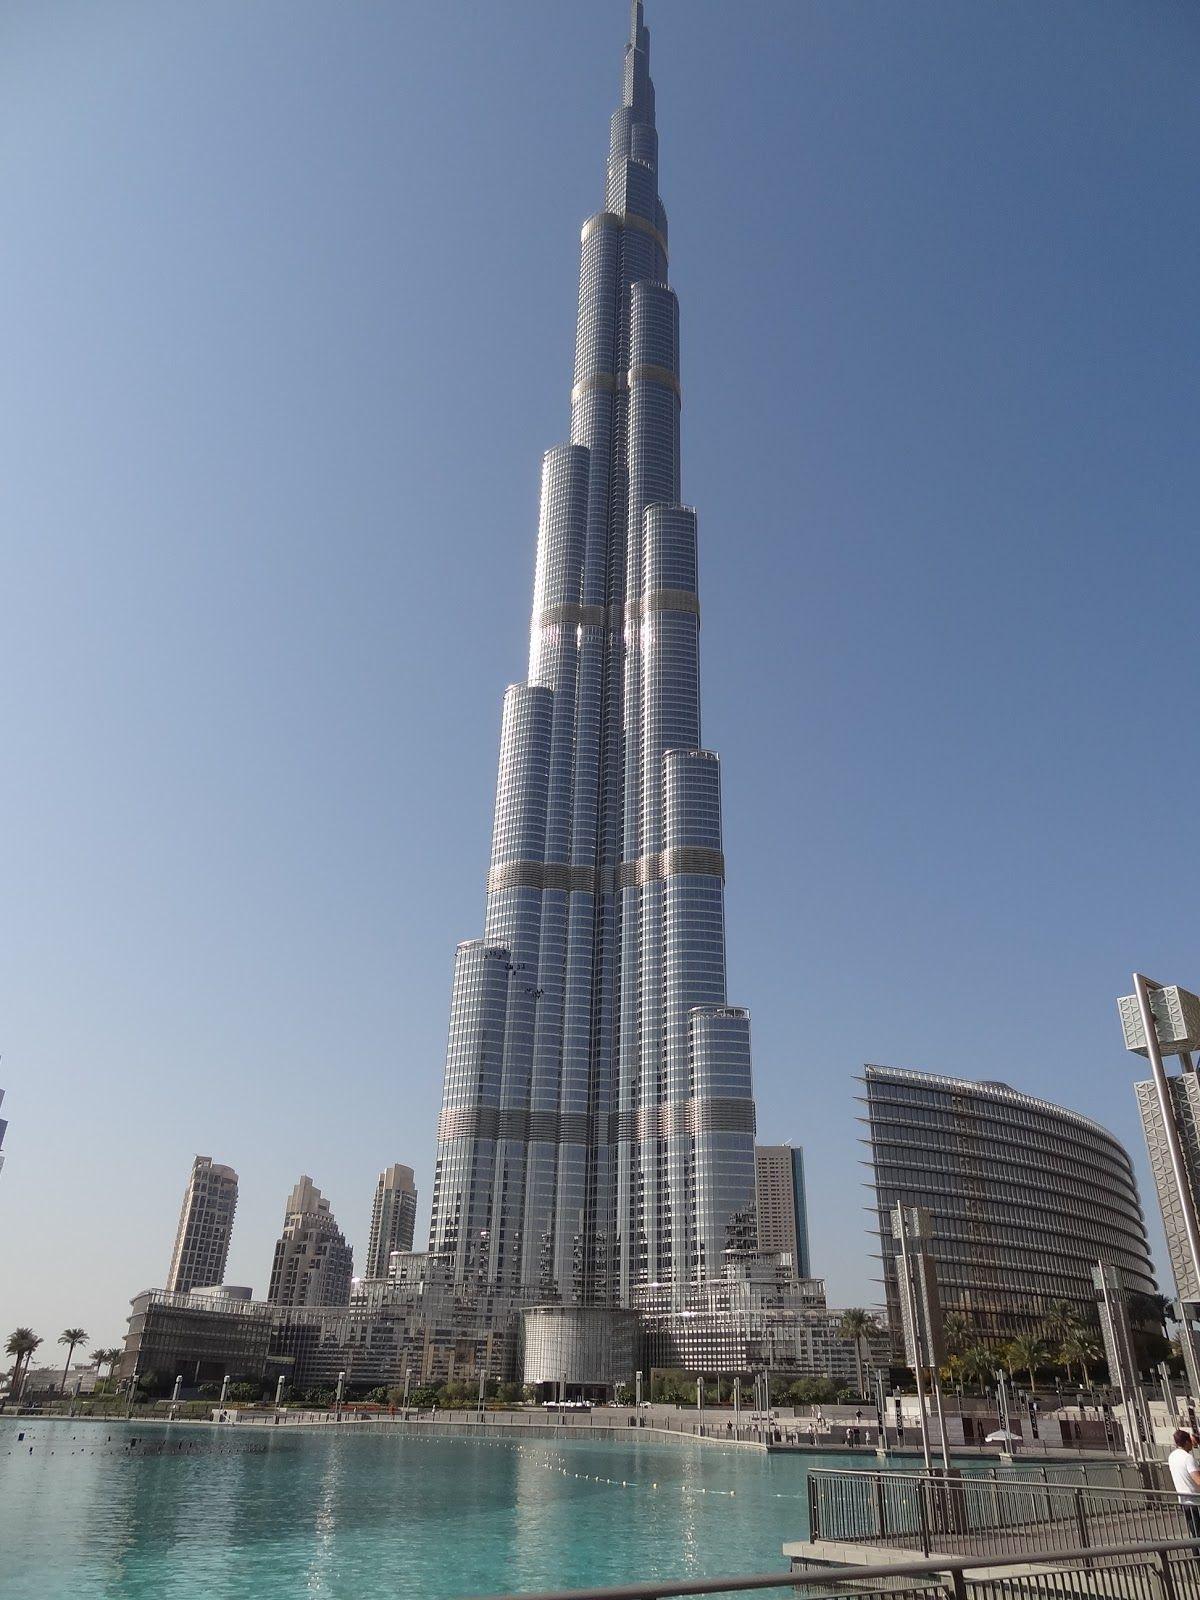 Burj khalifa dubai tallest building inthe world burj for Biggest hotel of dubai